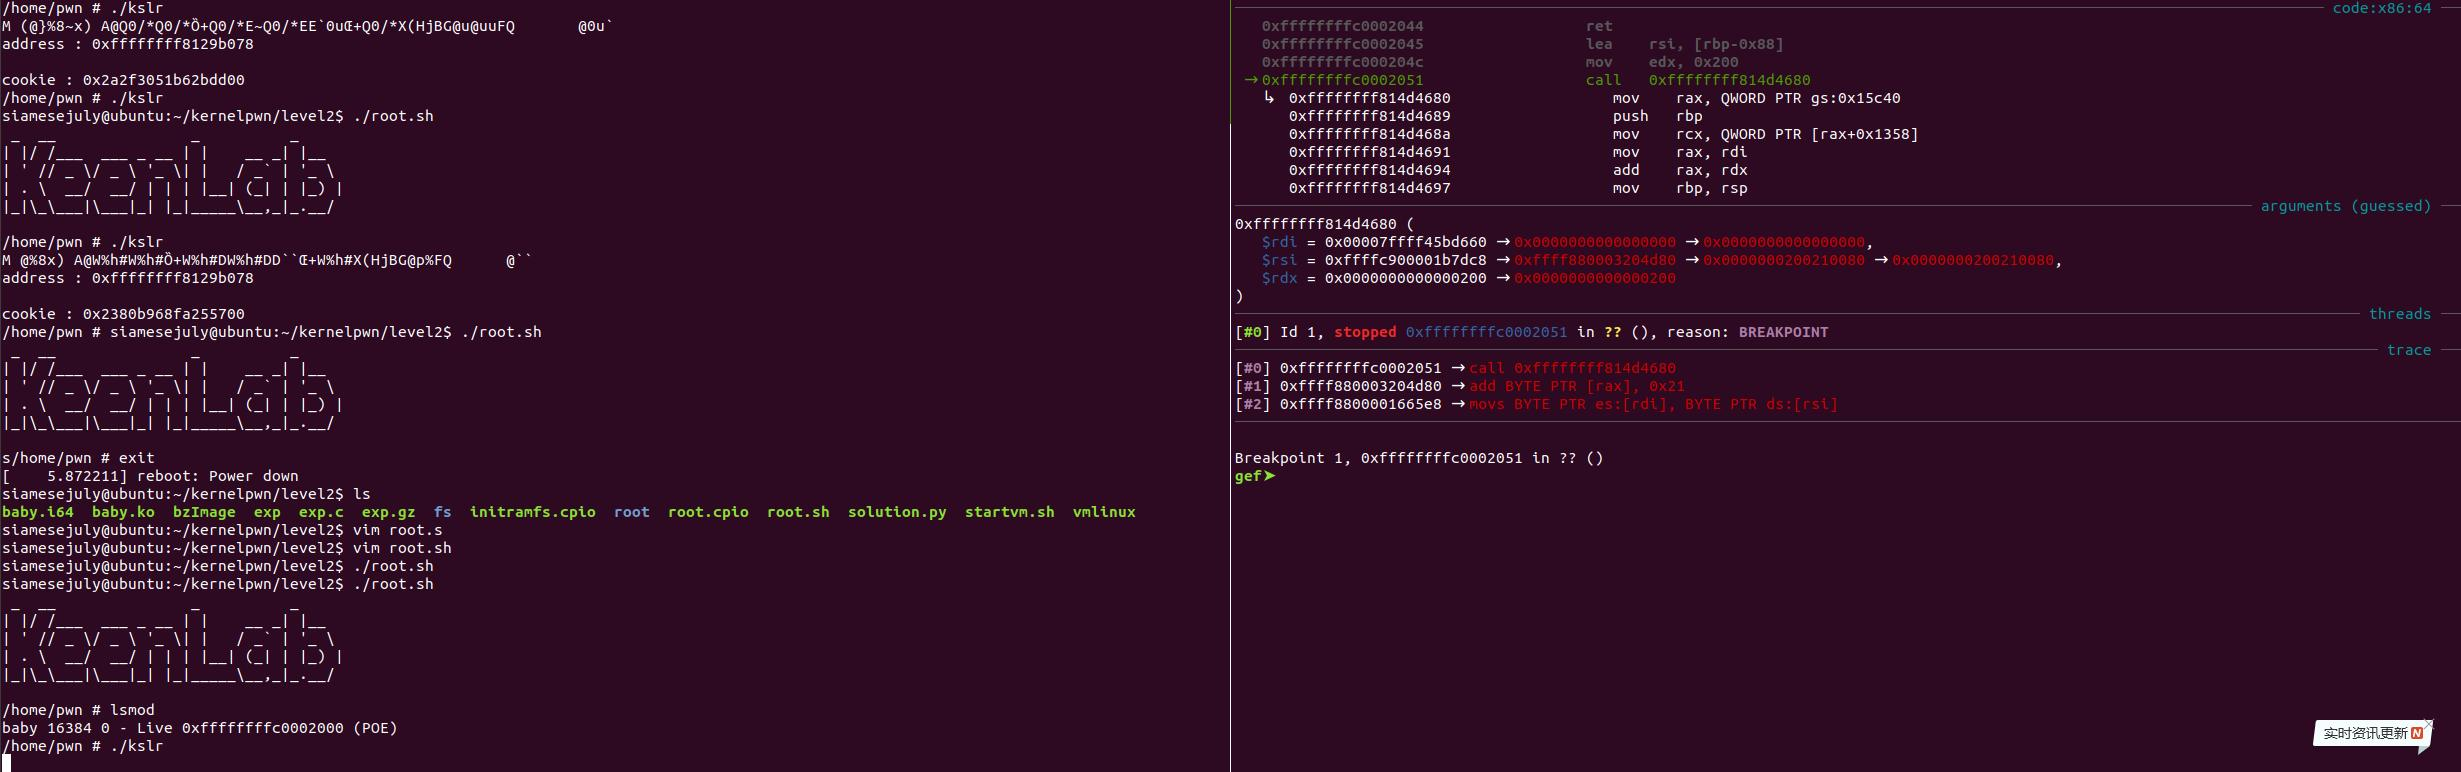 老表带你学Linux kernel pwn 入门(二)